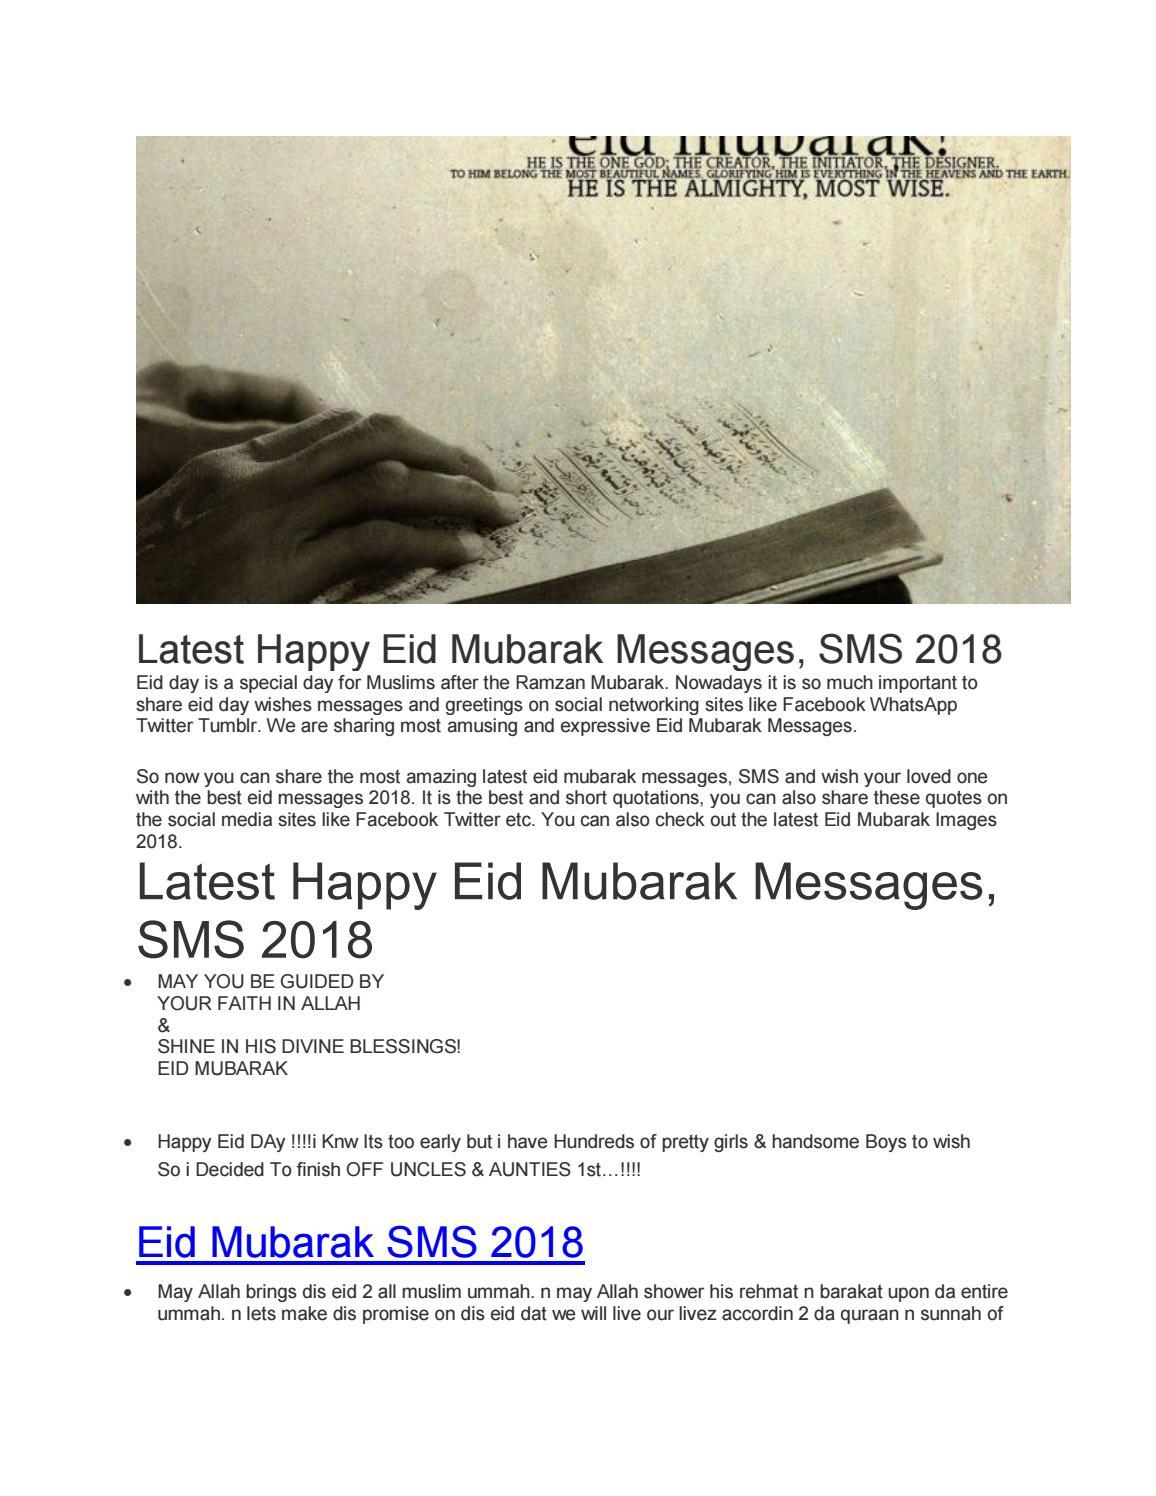 Latest Happy Eid Mubarak Messages Sms 2018 By Zill E Huma Issuu